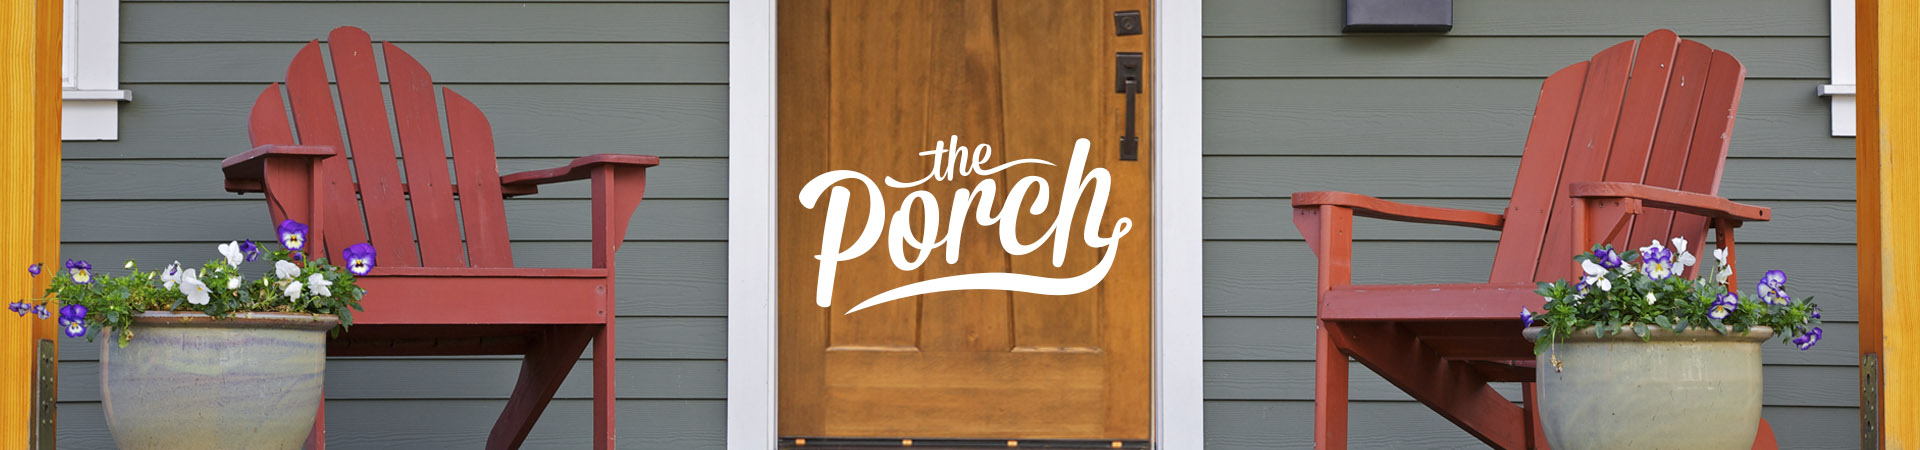 19-150-1301-BBR-2019-Porch_September_WelcomeToThePorch (1)